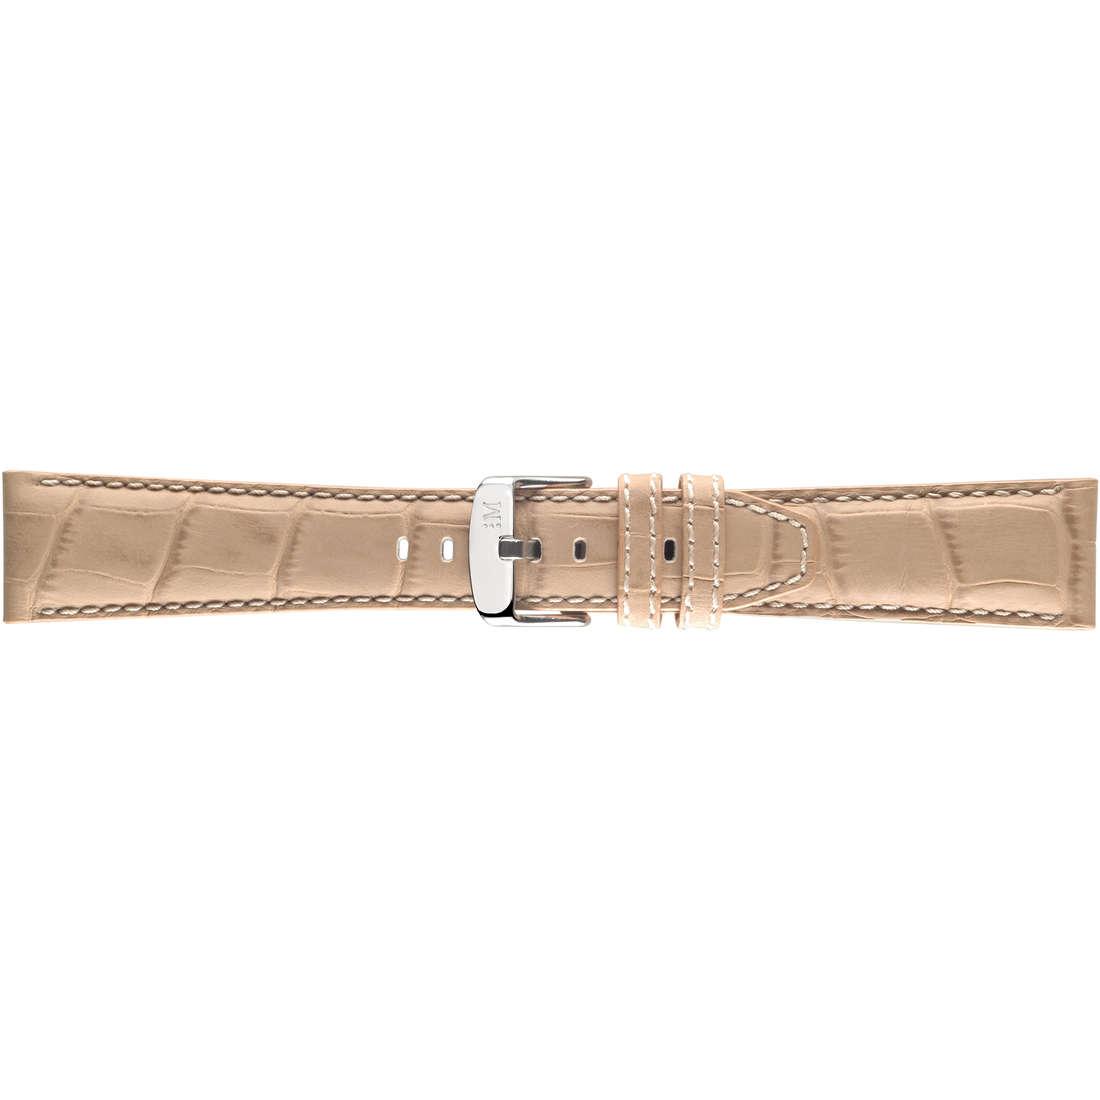 montre bande de montres homme Morellato Linea Sport A01X4497B44027CR18